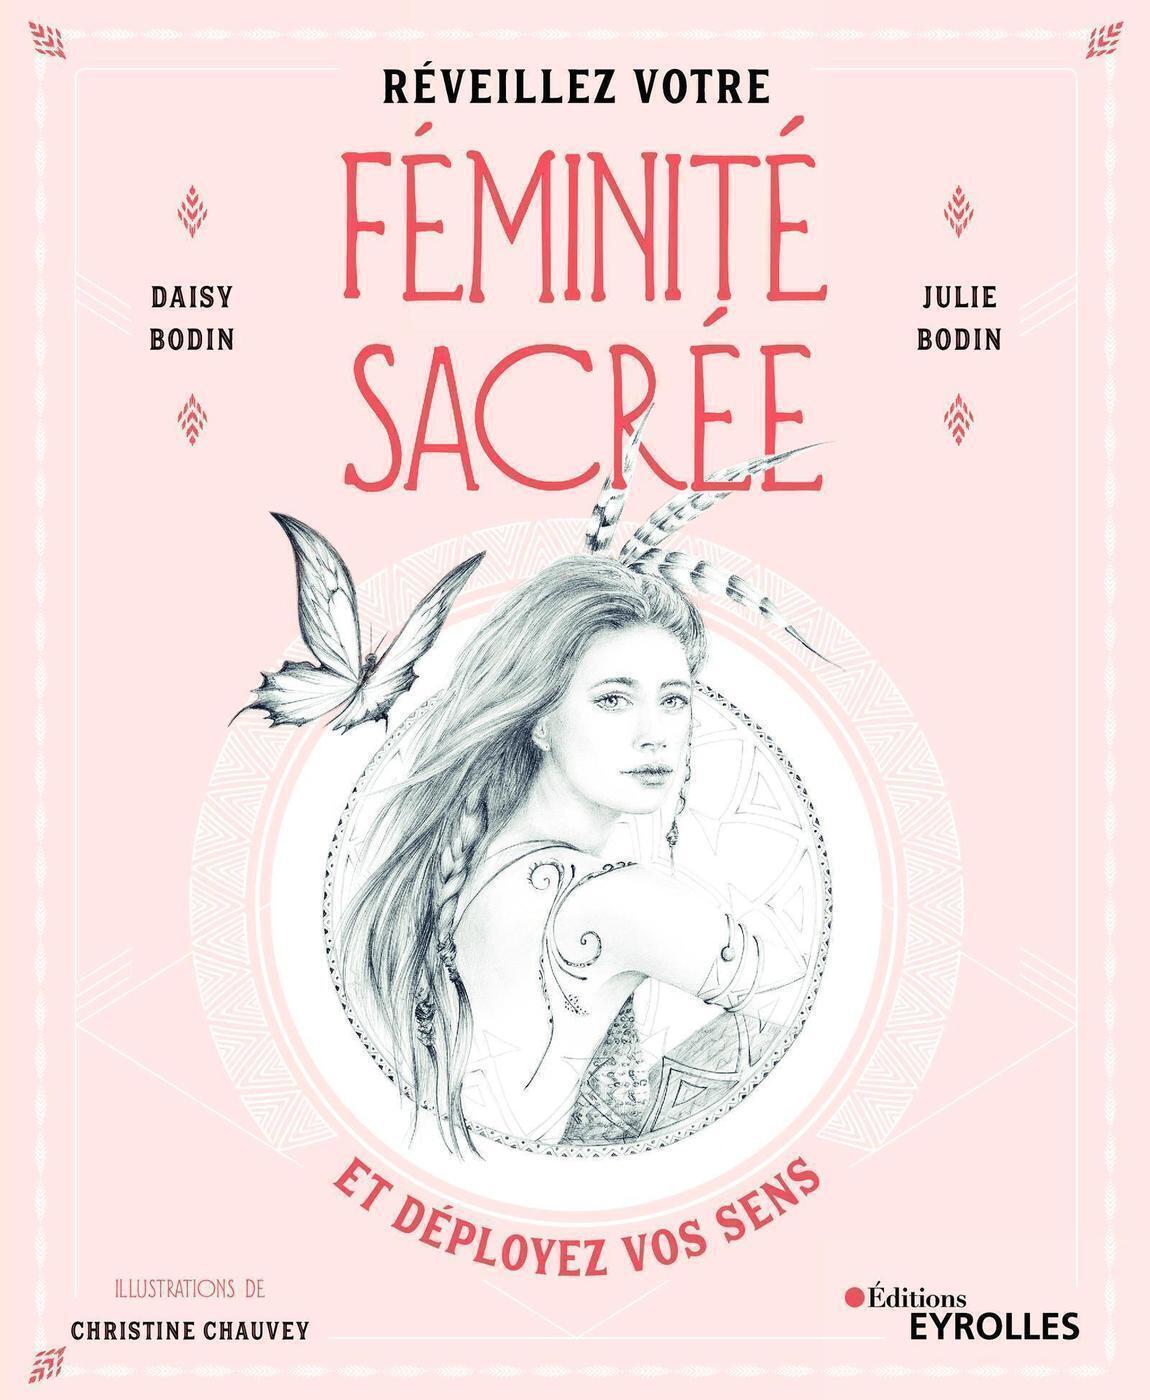 REVEILLEZ VOTRE FEMINITE SACREE - ET DEPLOYEZ VOS SENS